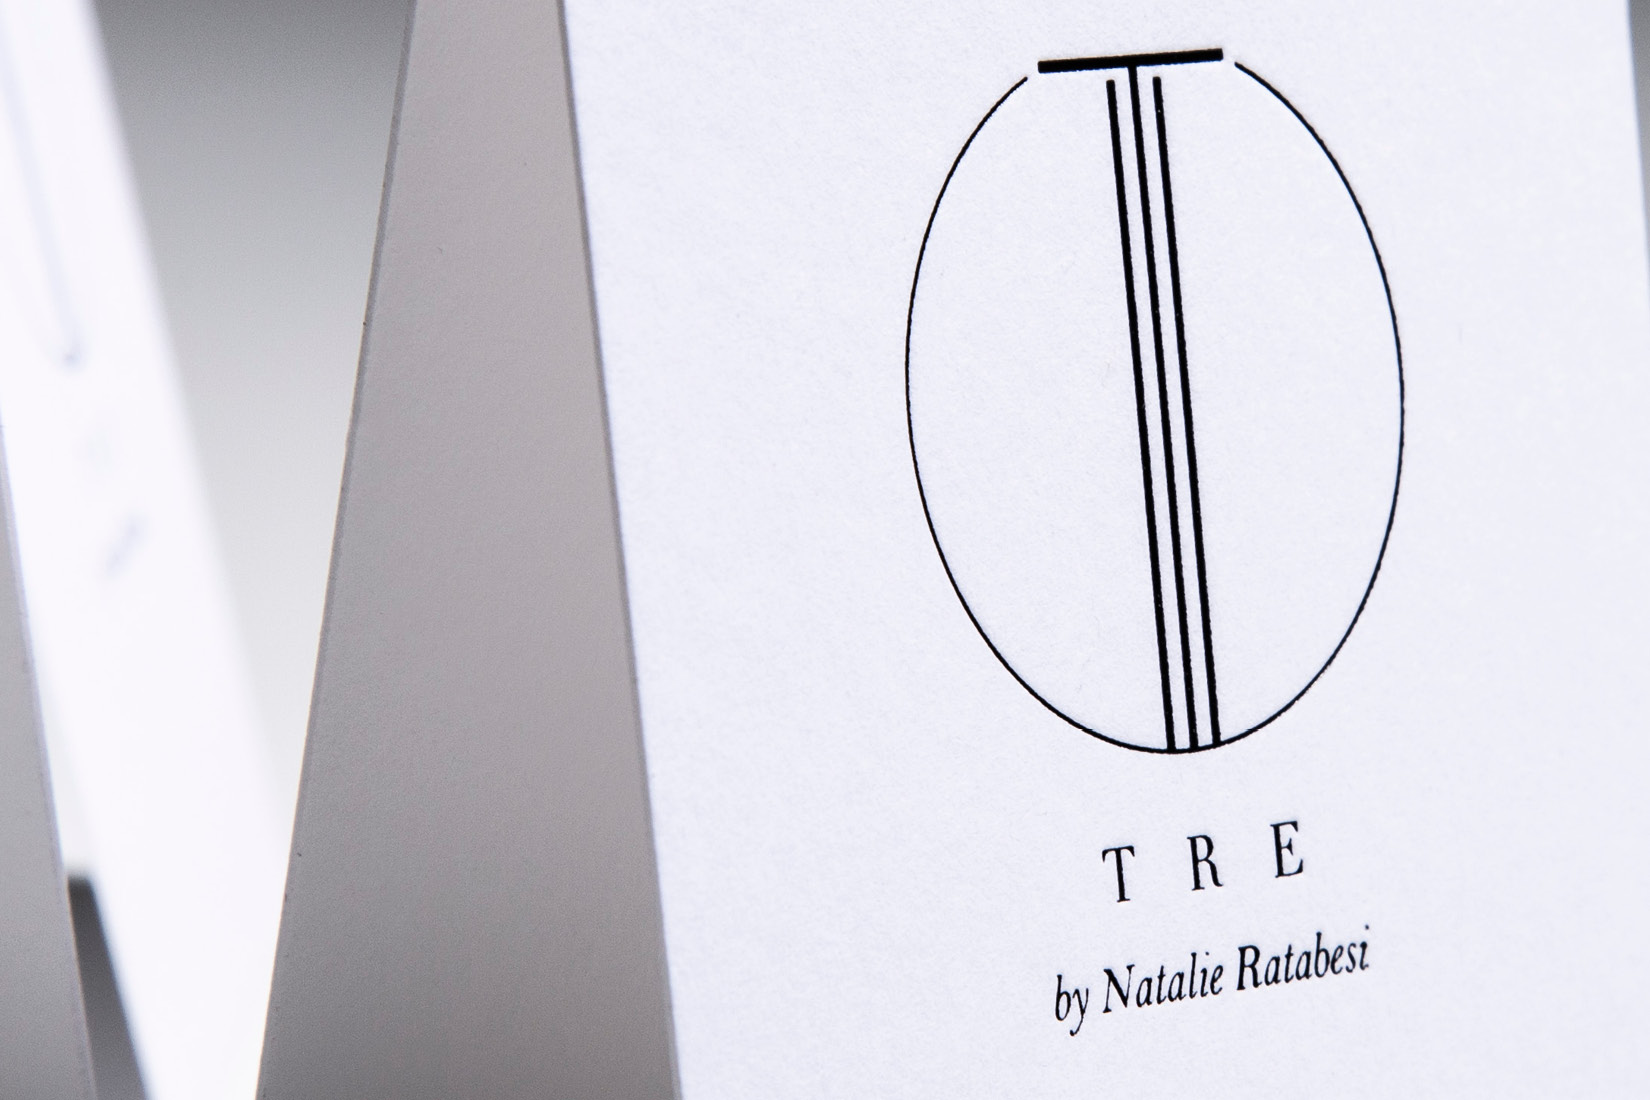 Print of the TRE brand logo by Natalie Ratabesi.